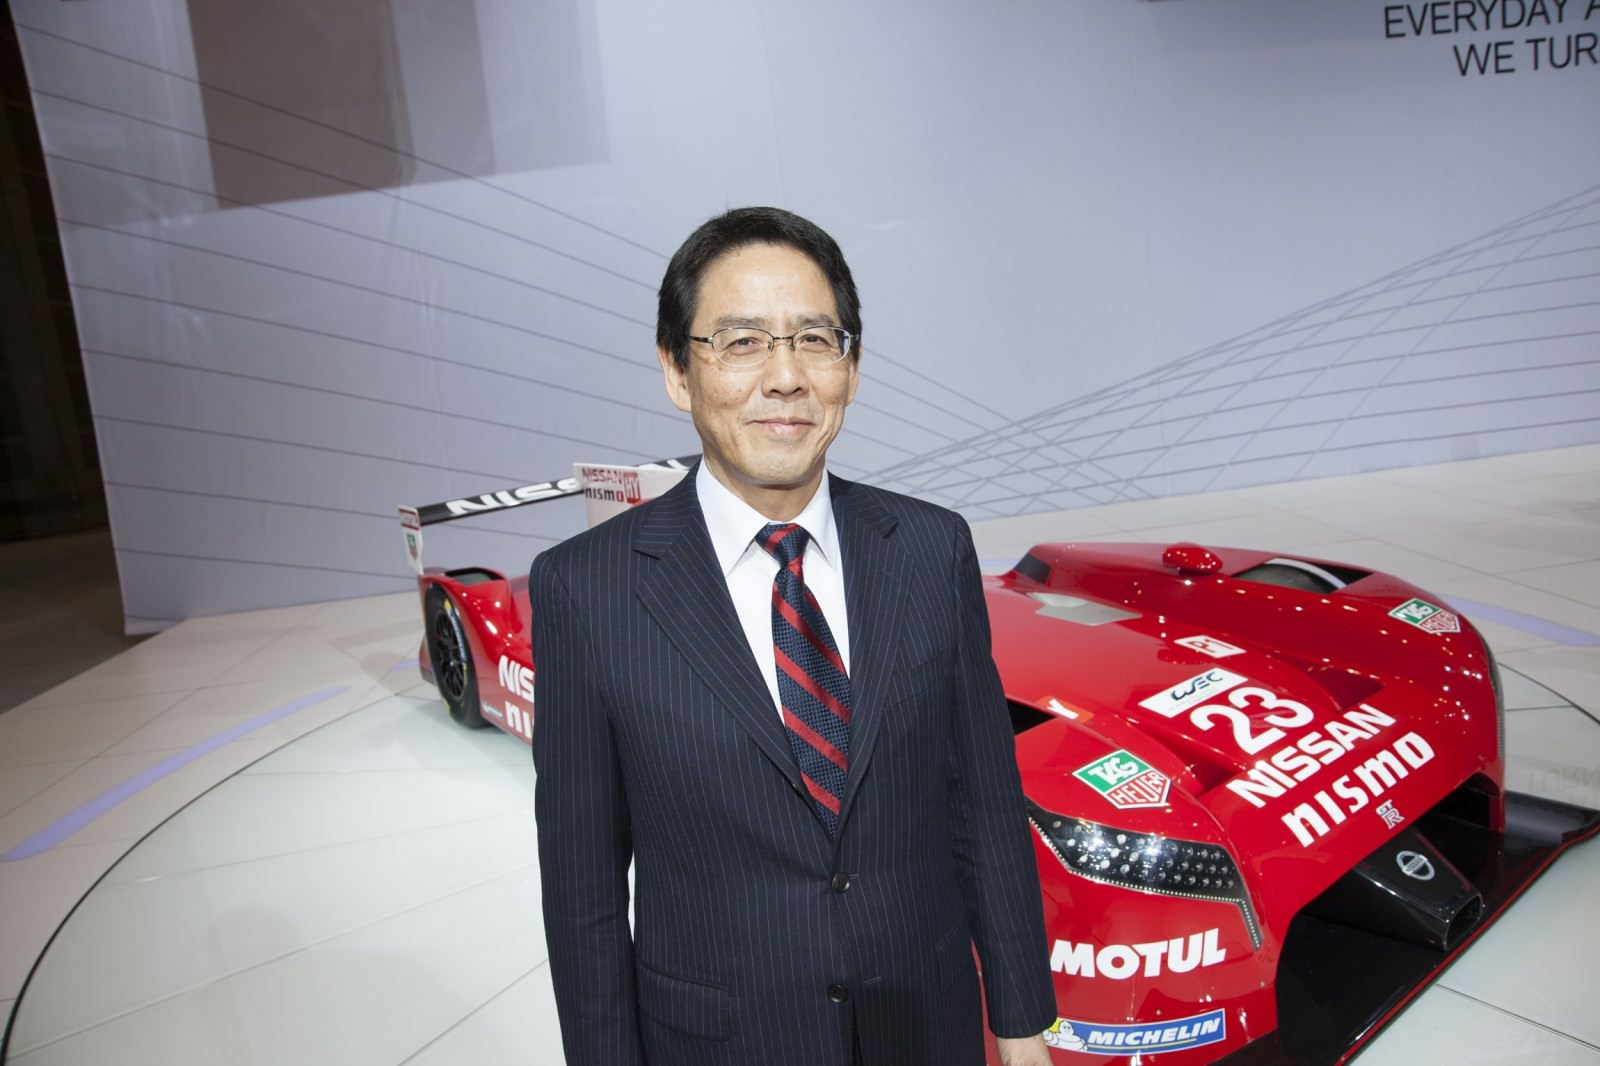 Shoichi Miyatani